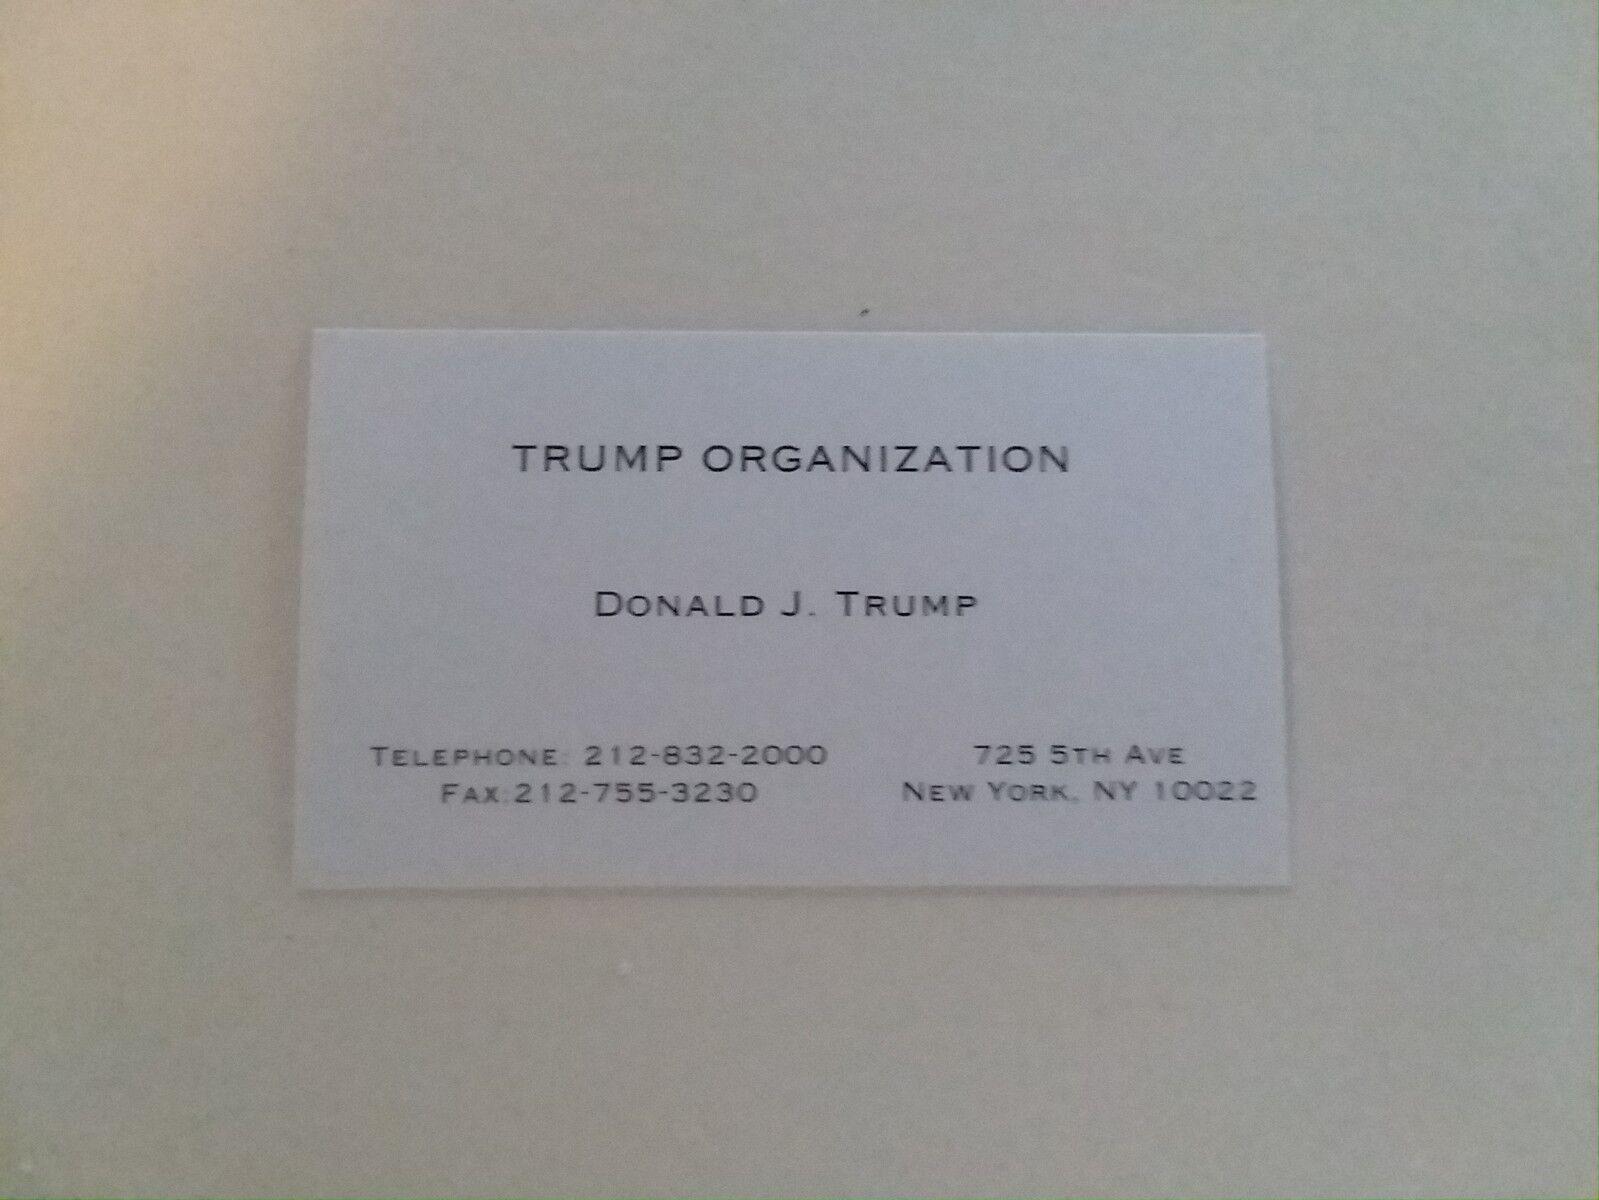 Donald trump business card trump organization shopping ebay with donald trump business card trump organization colourmoves